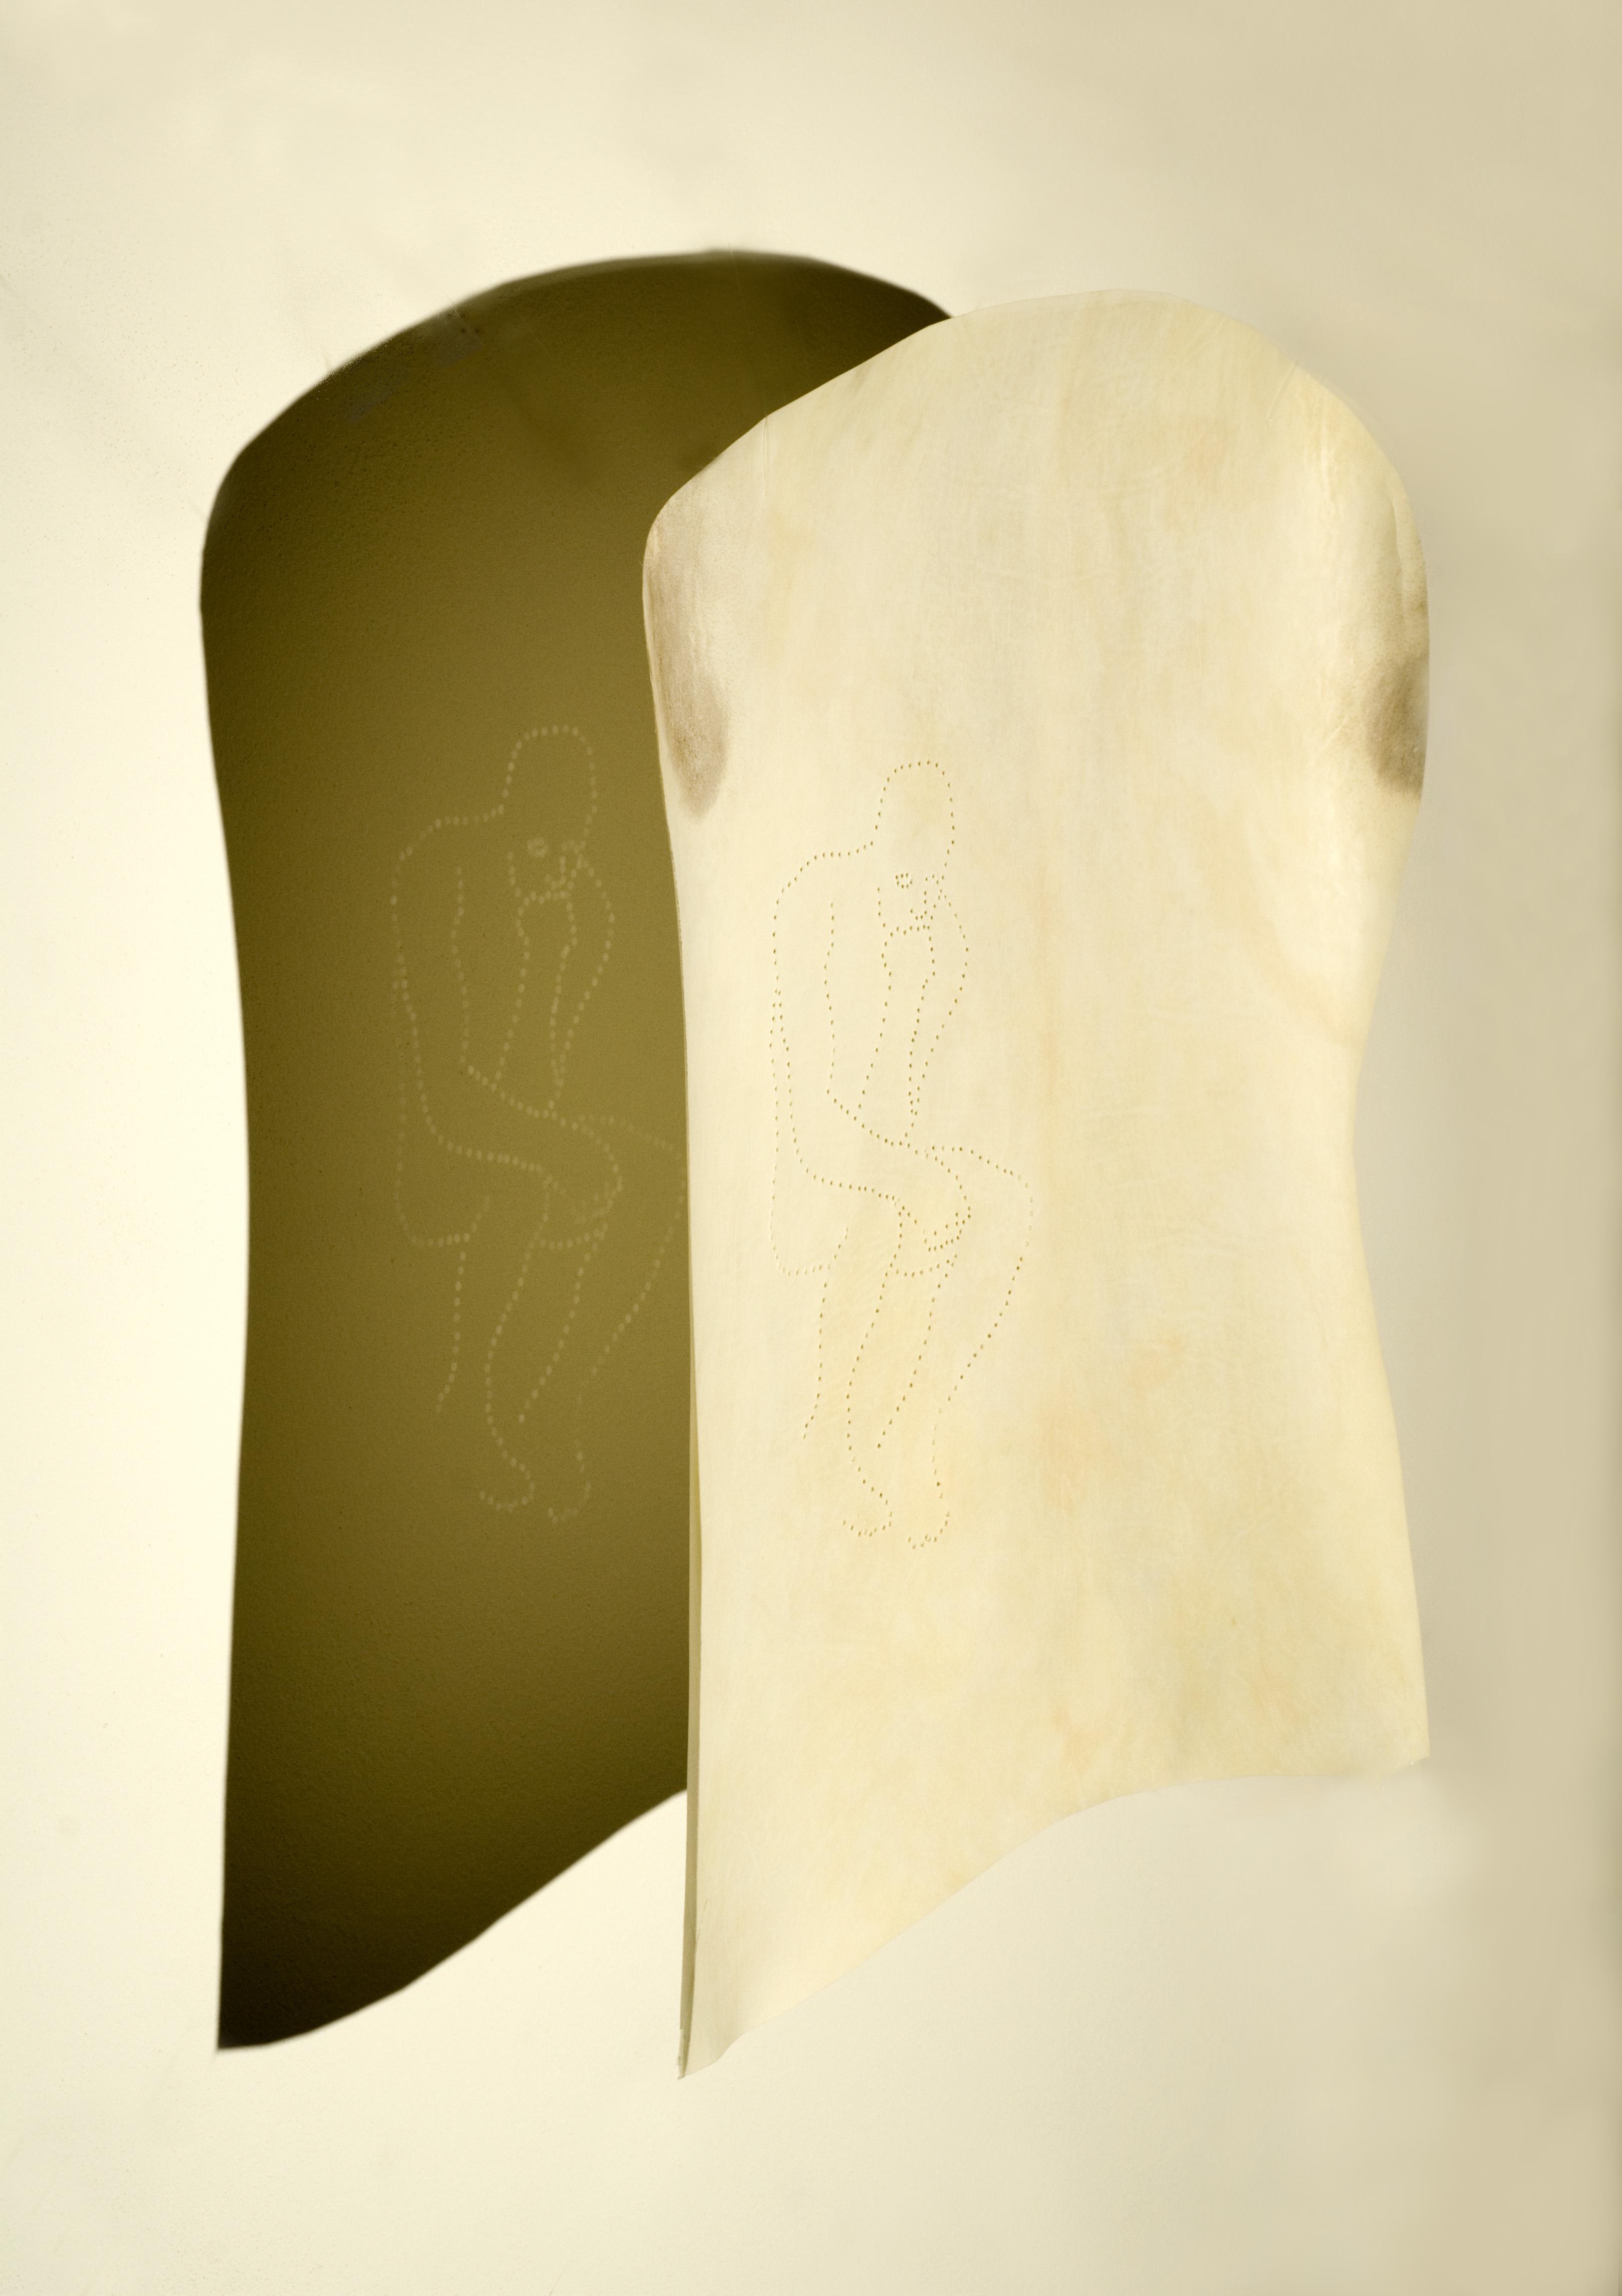 reflection-rodins-thinker-52x44x20cm-light-through-pierced-parchment